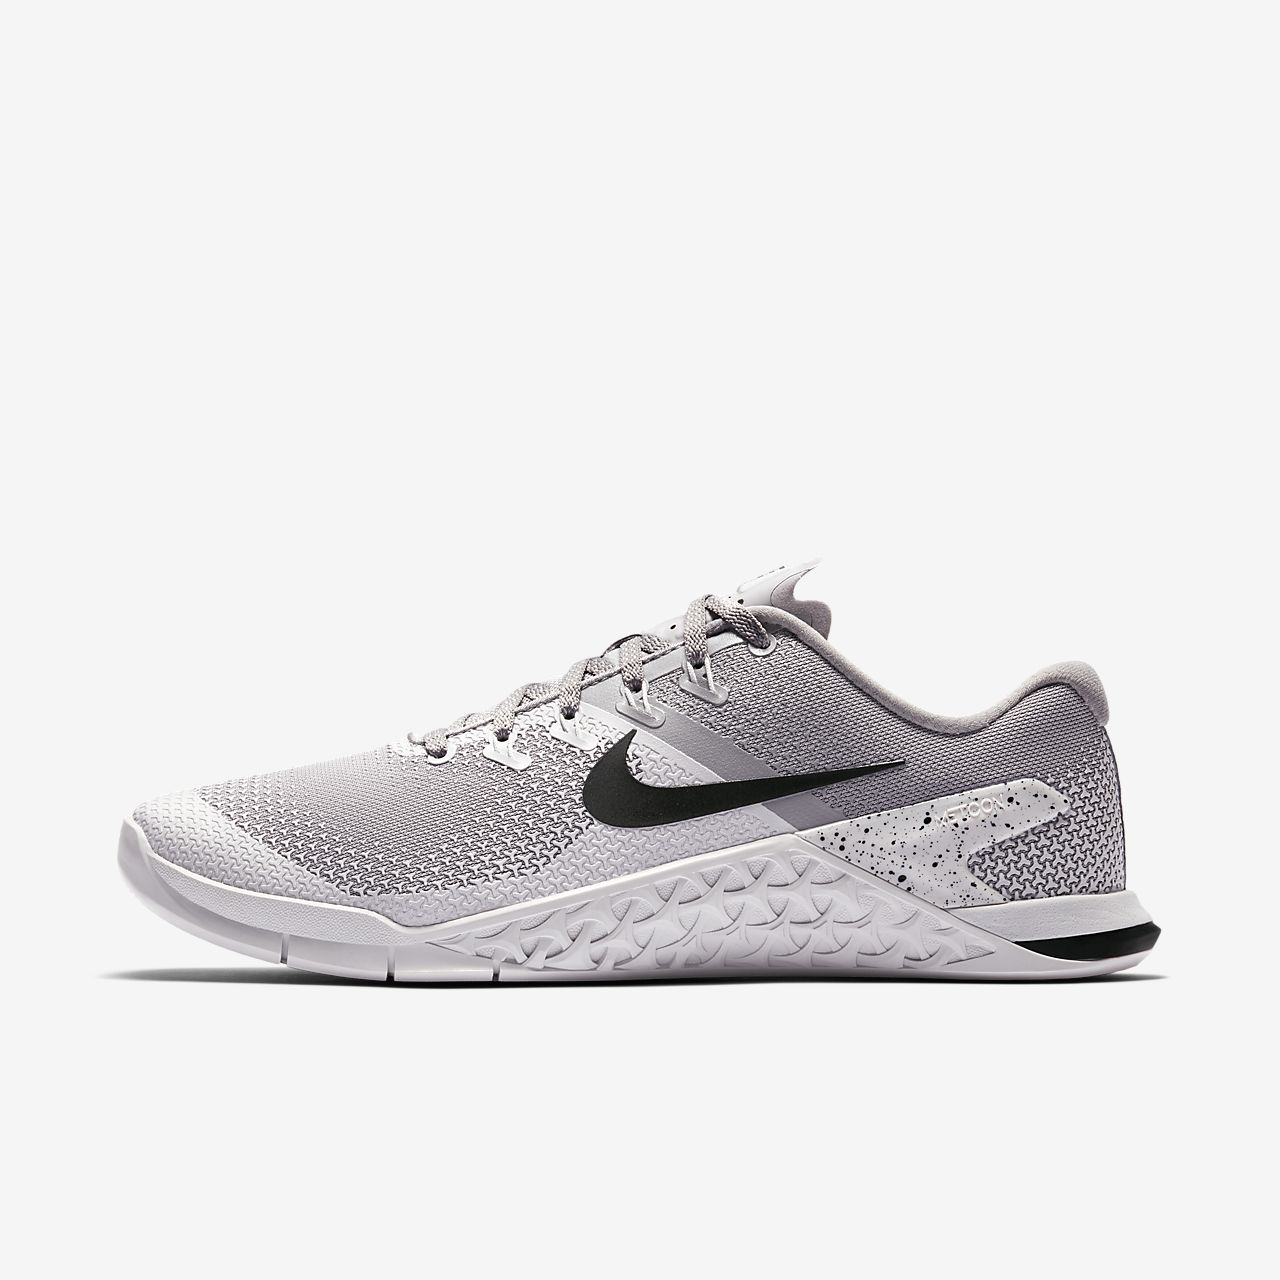 Metcon 4 Chaussures De Sport Nike 0pR4bzvi